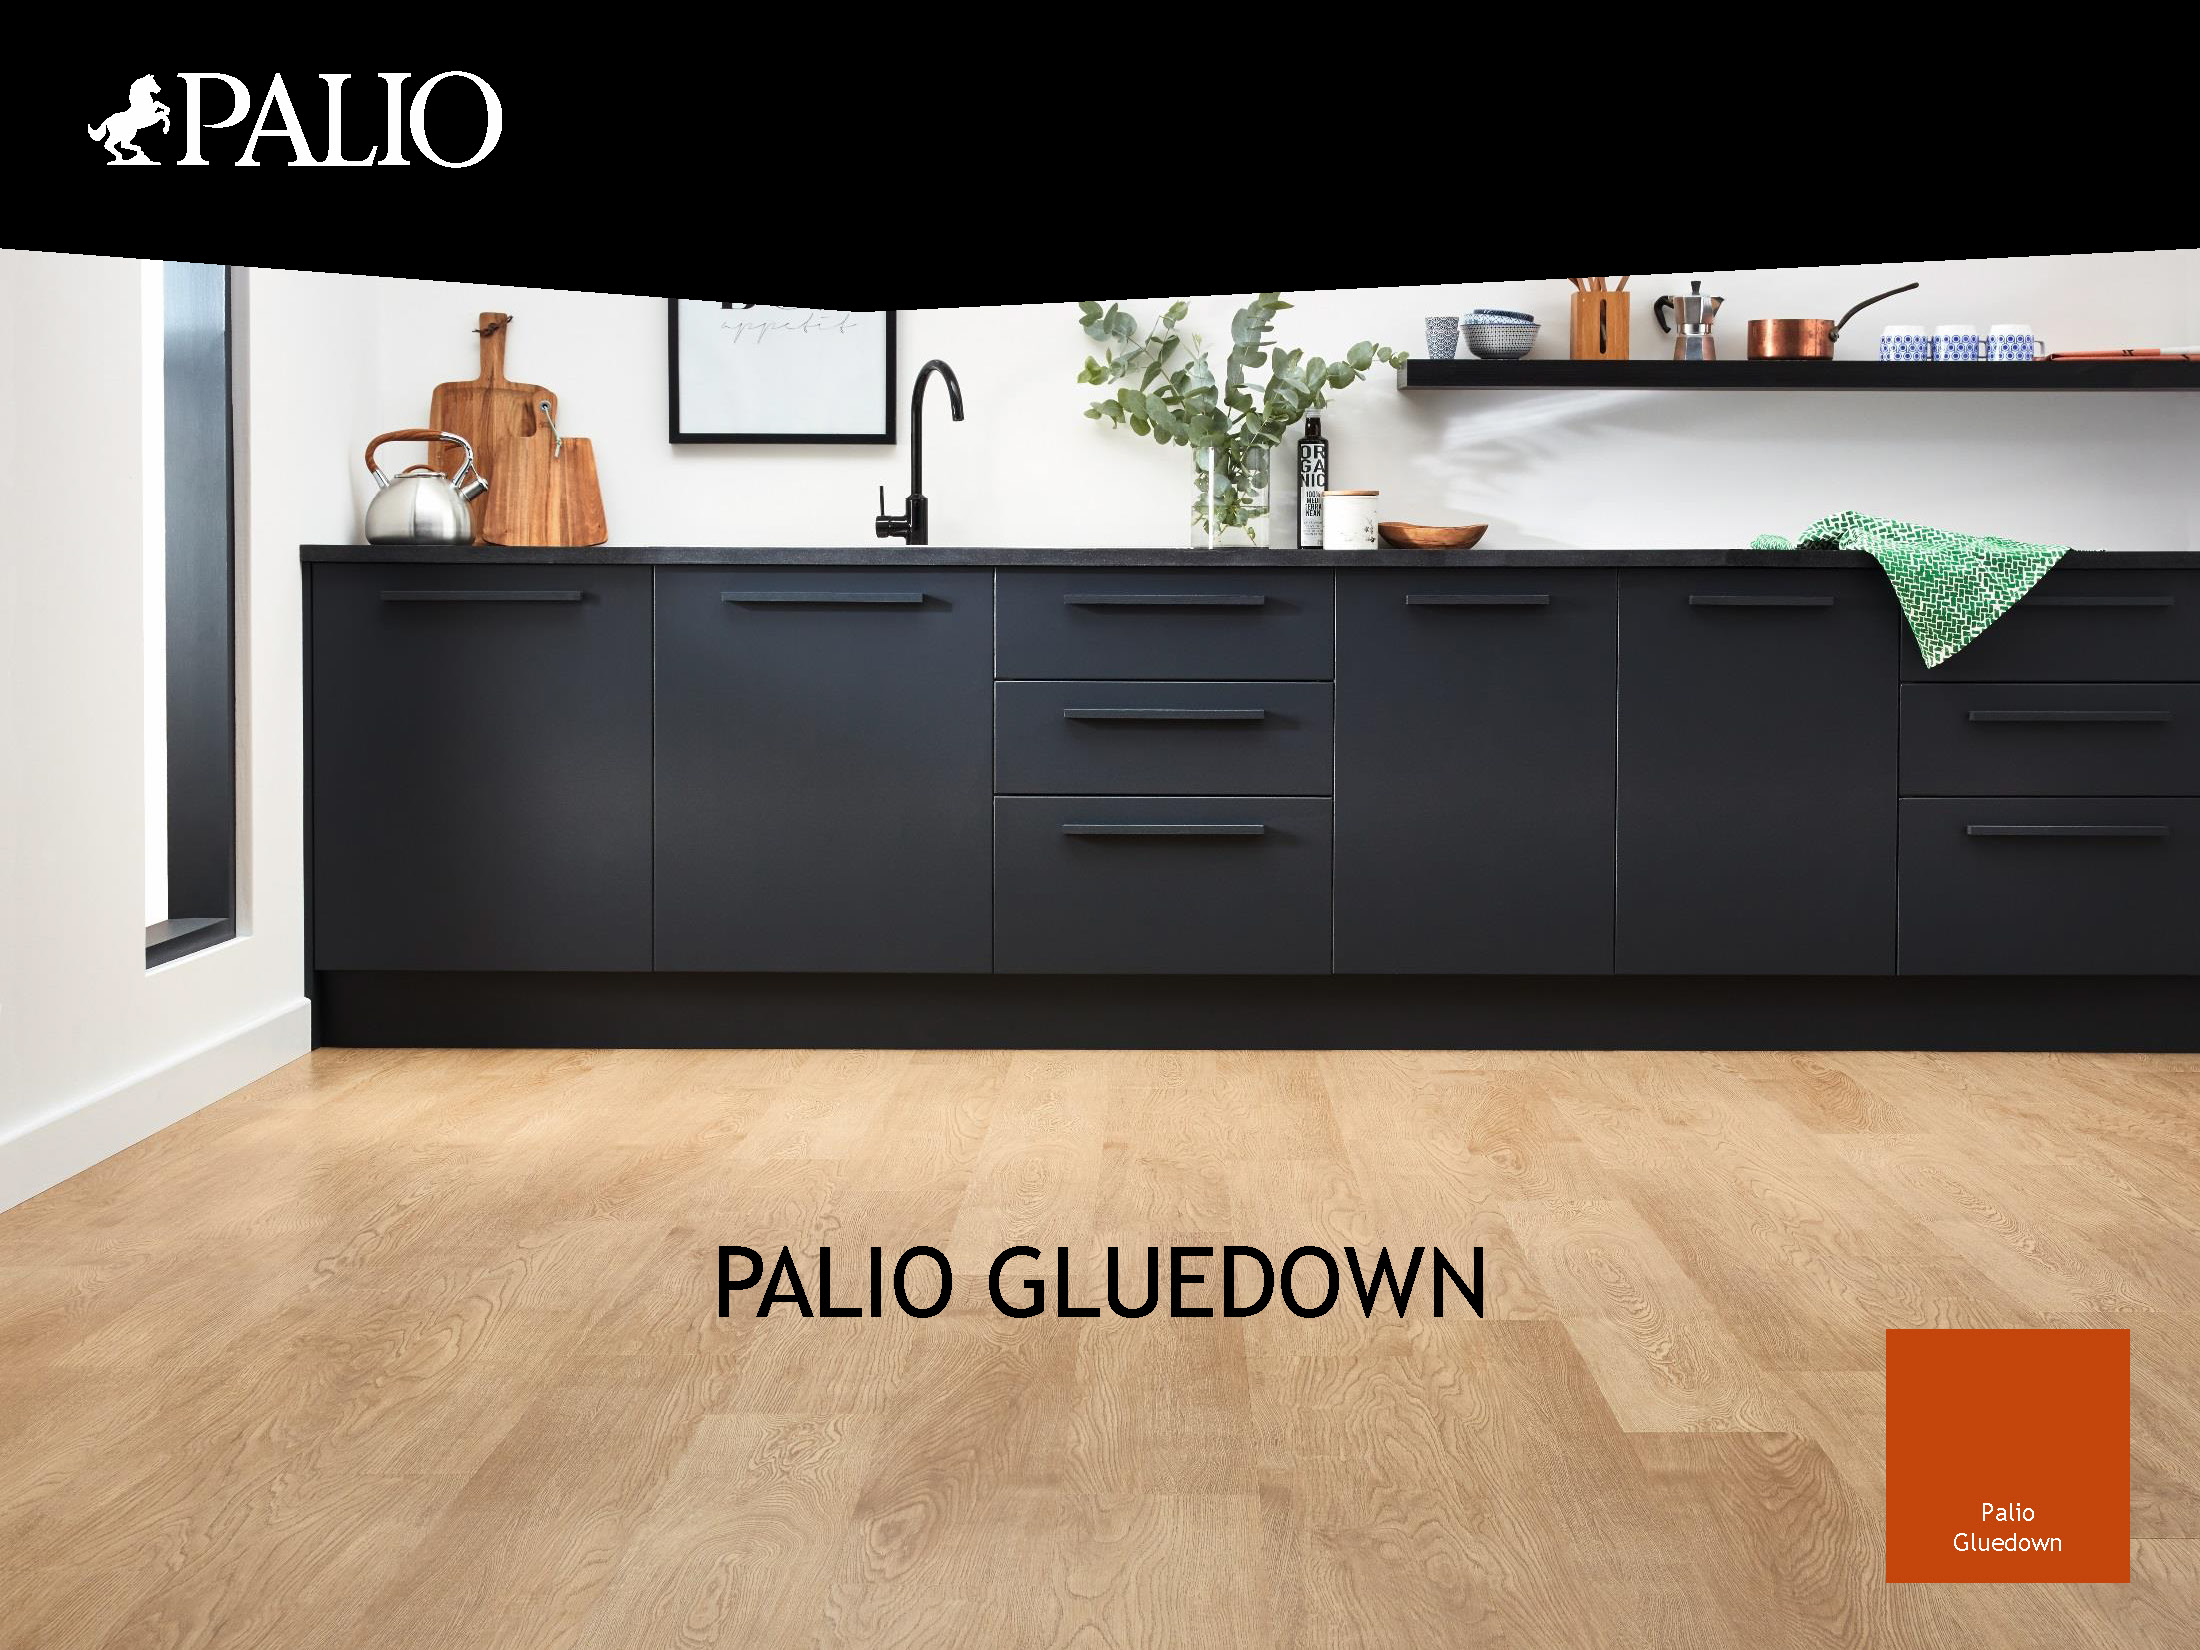 Palio Gluedown